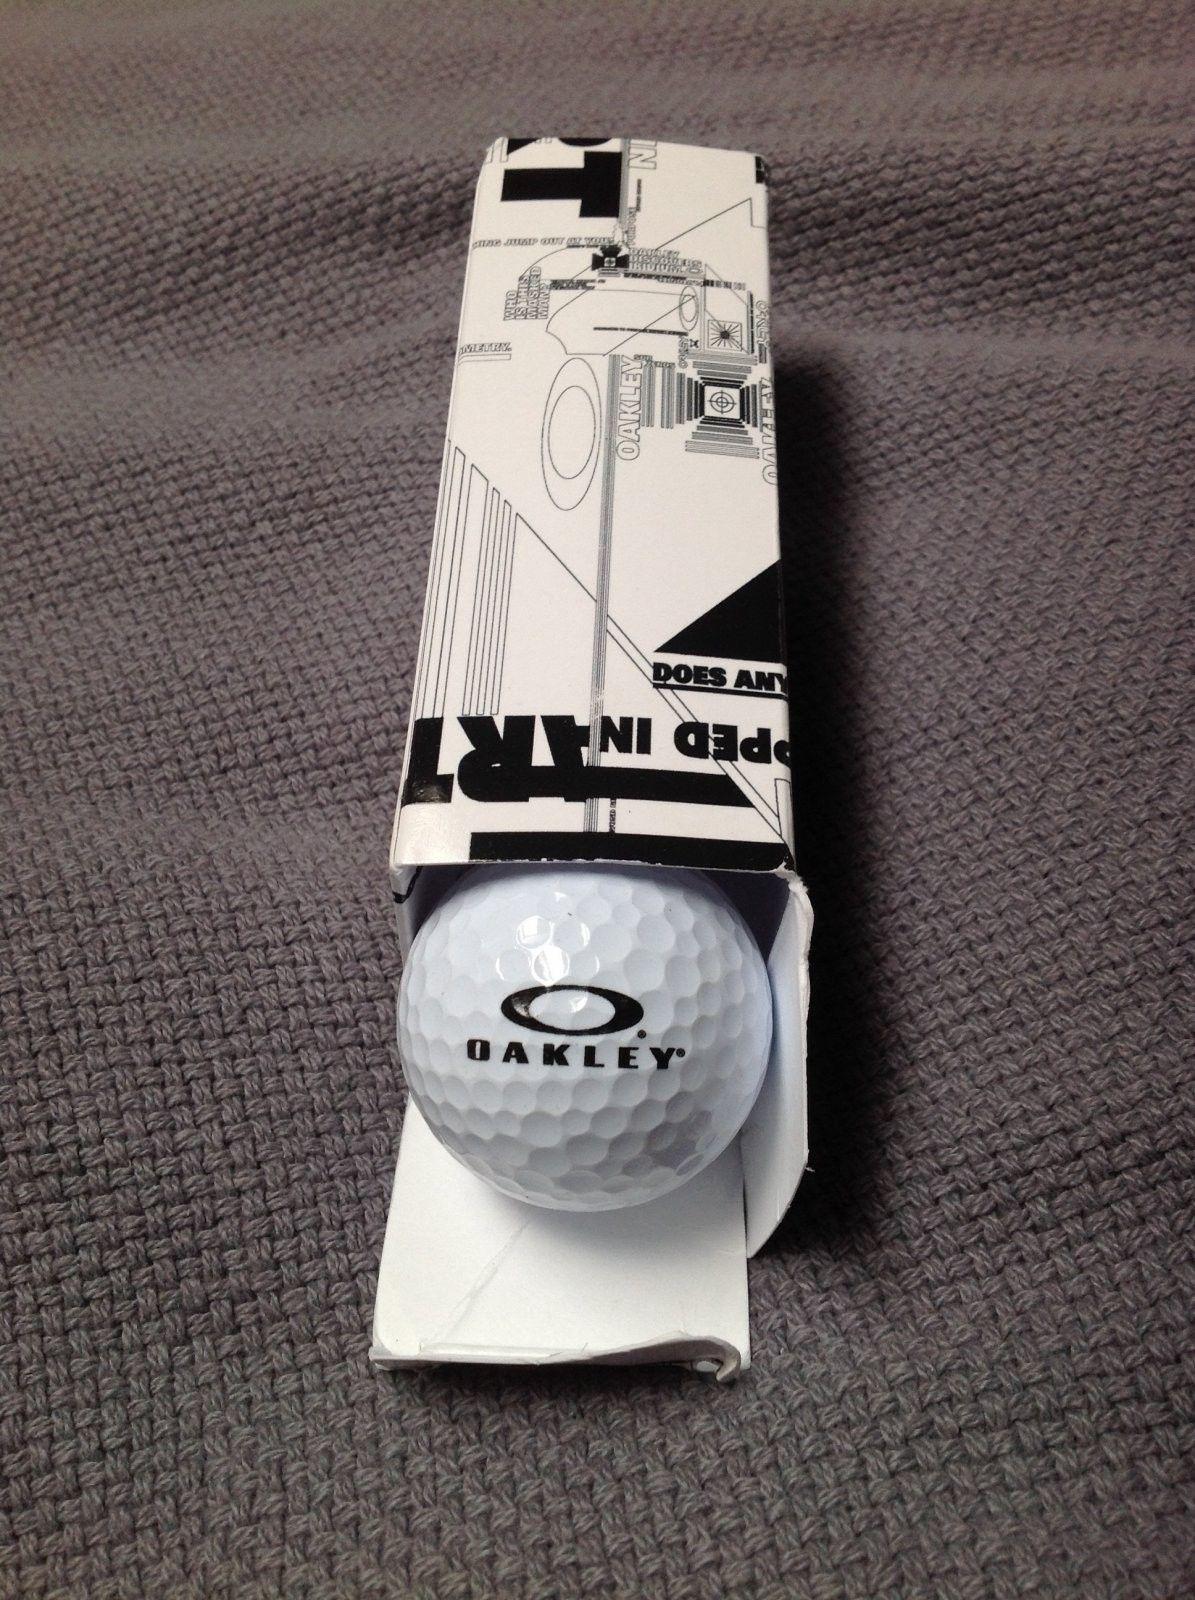 Oakley Golf Balls - image.jpg